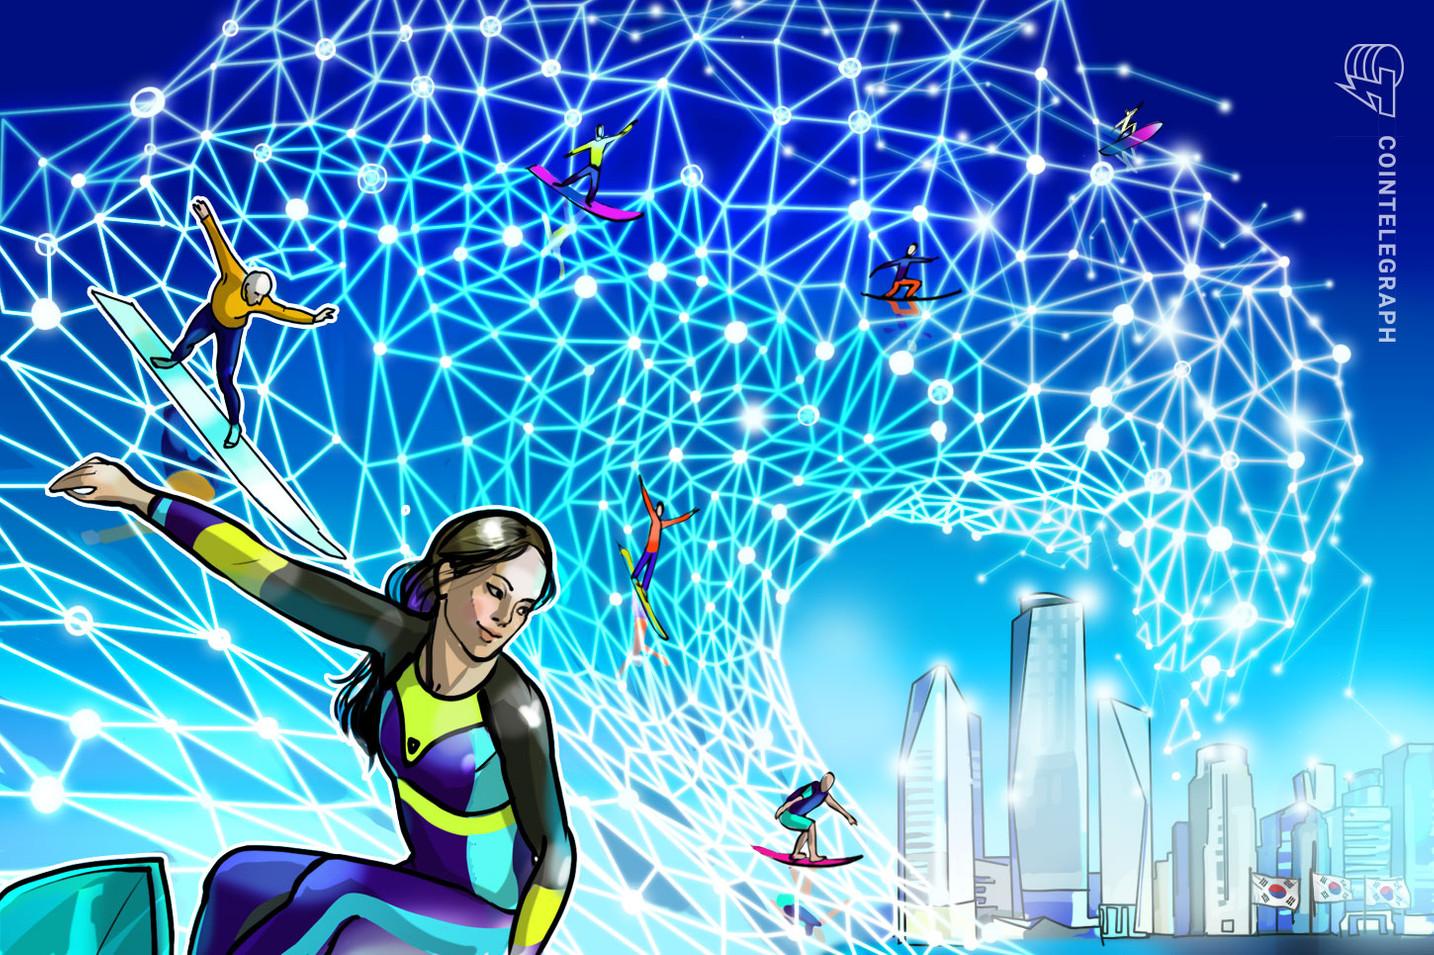 Südkorea: Staatliche IT-Firma entwickelt Blockchain-Handelsplattform